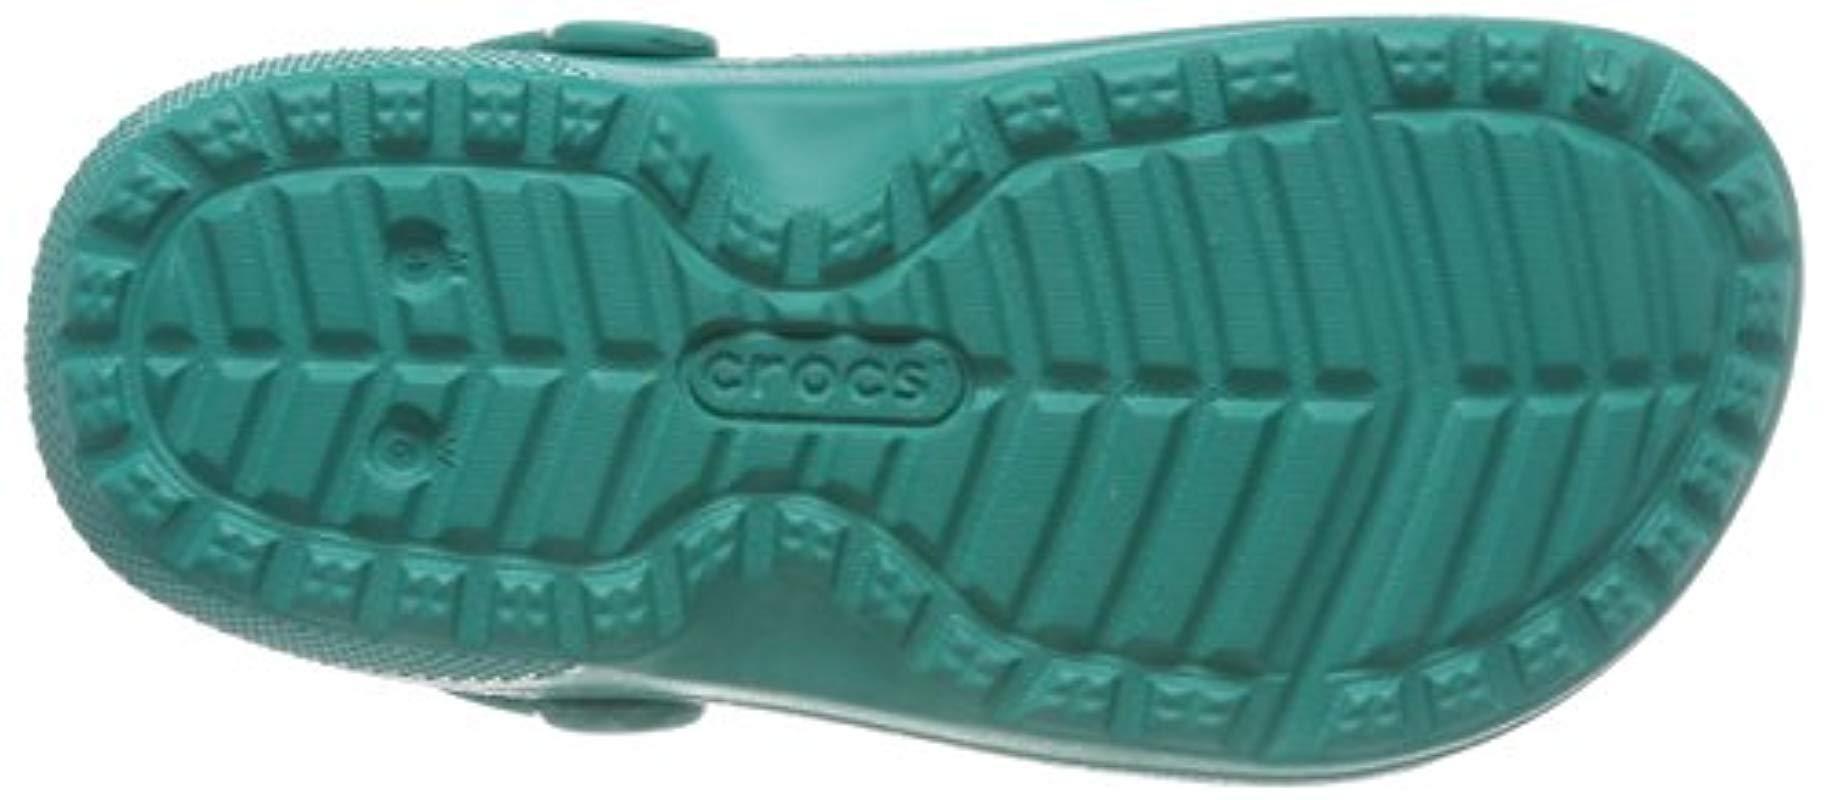 b5b02bda2 Crocs™ - Blue Unisex Adults  Specialist Ii Clog - Lyst. View fullscreen